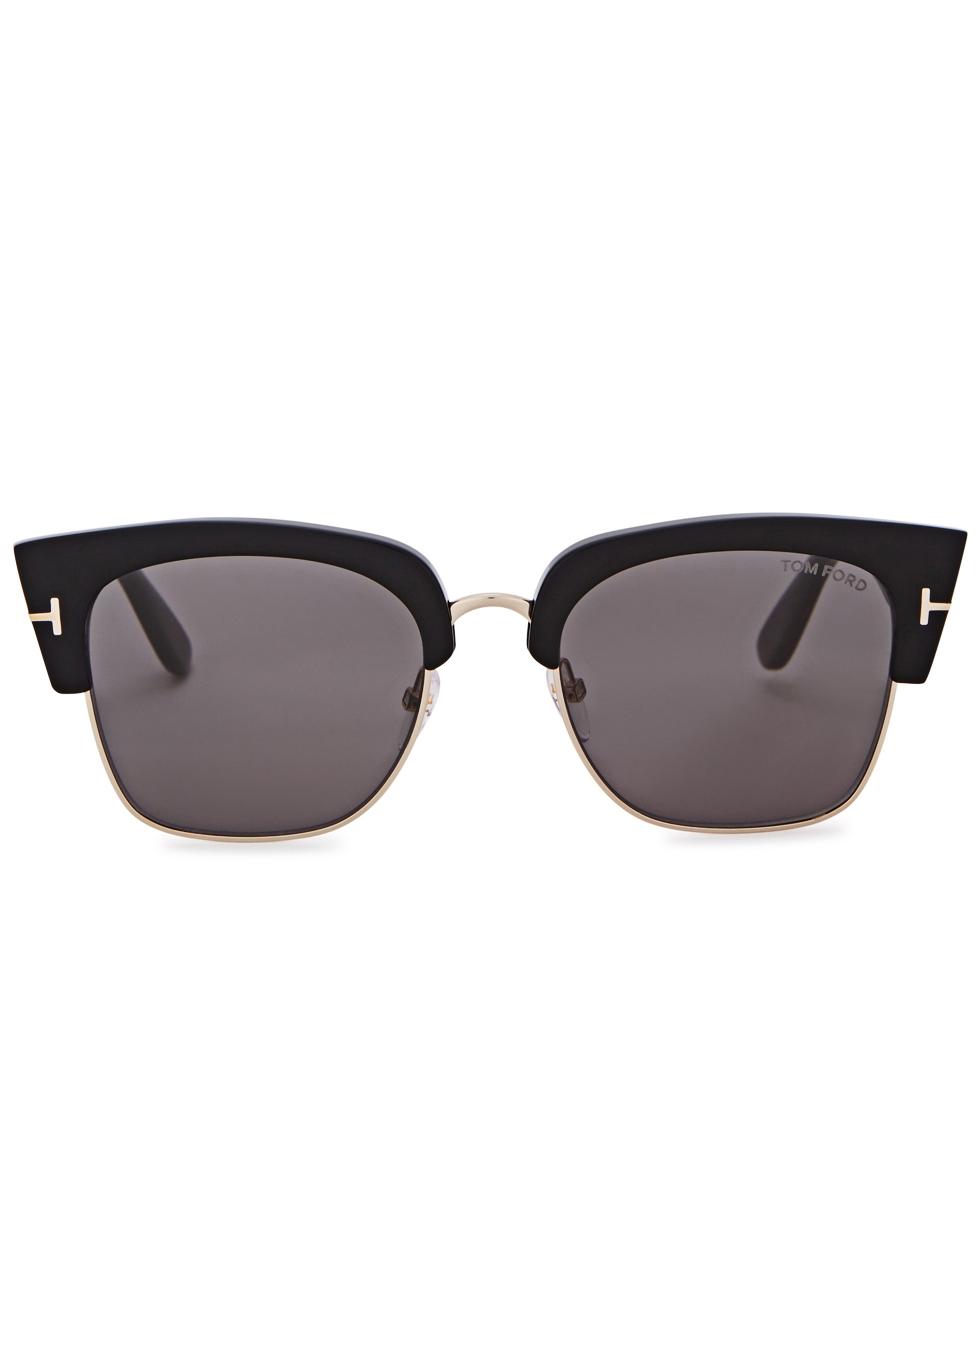 Dakota black clubmaster-style sunglasses - Tom Ford Eyewear